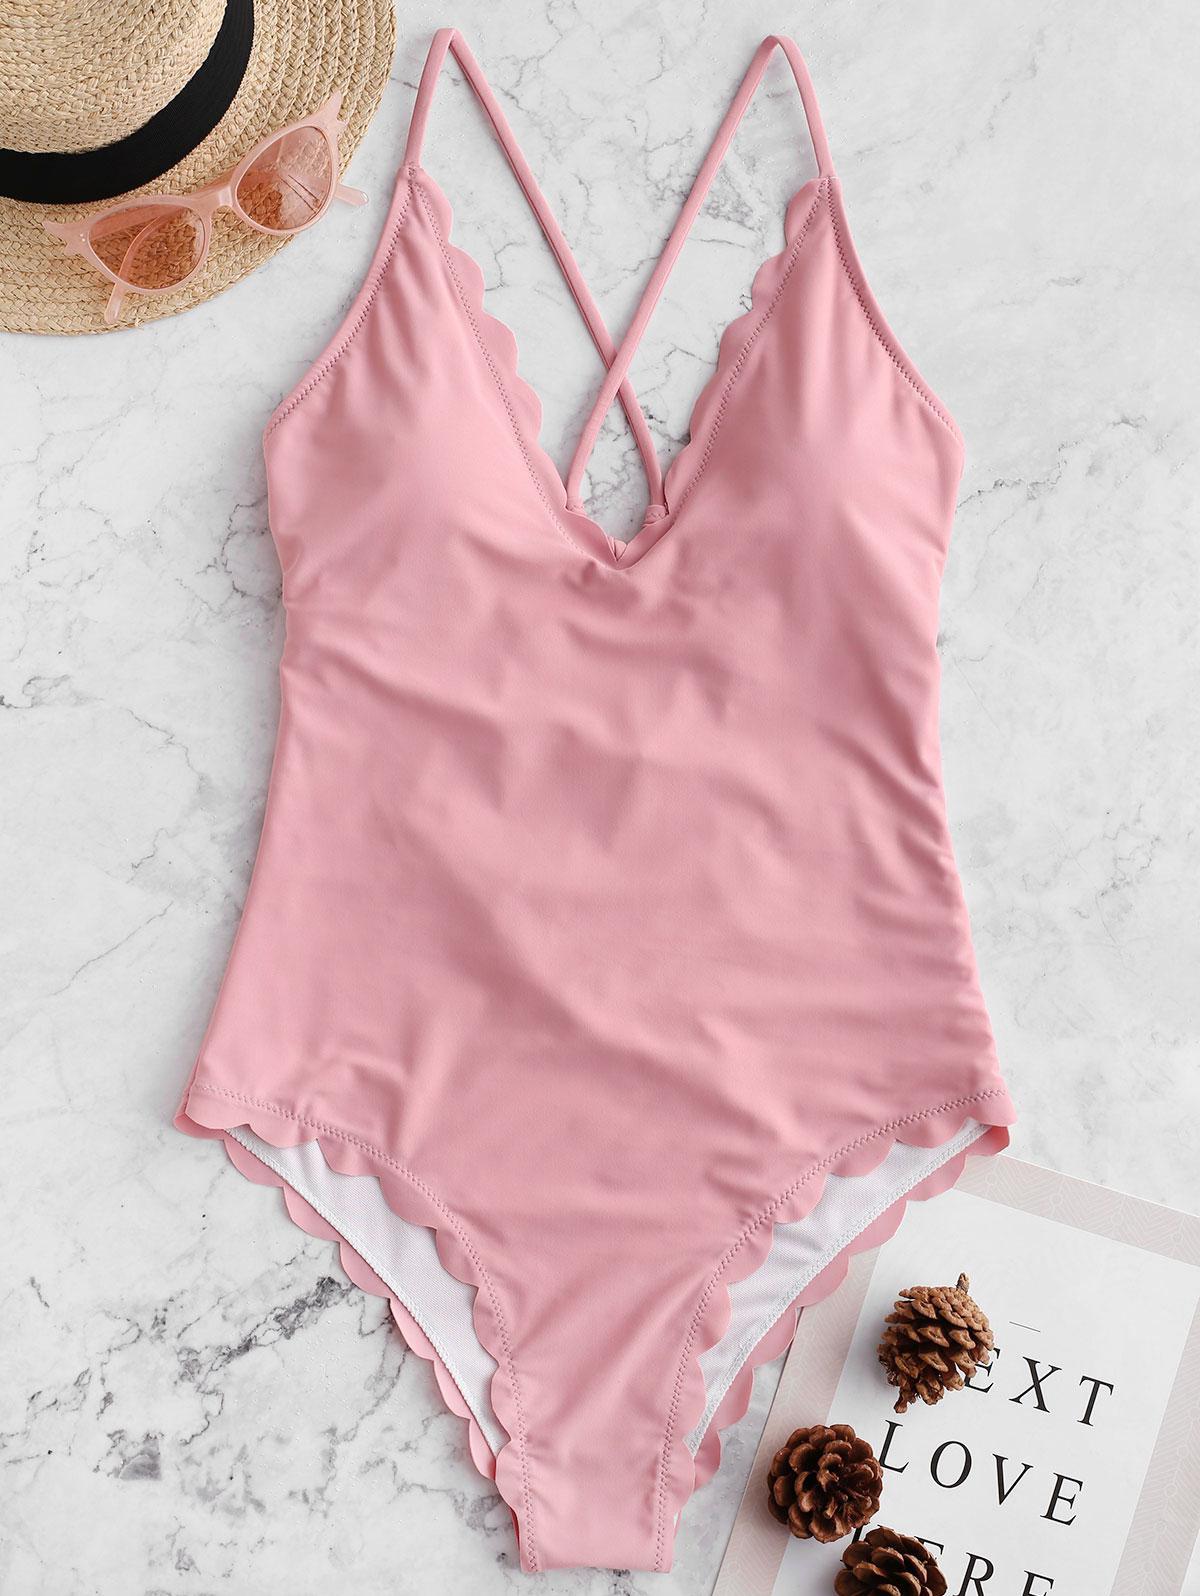 ZAFUL Crisscross Scalloped One-piece Swimsuit, Light pink